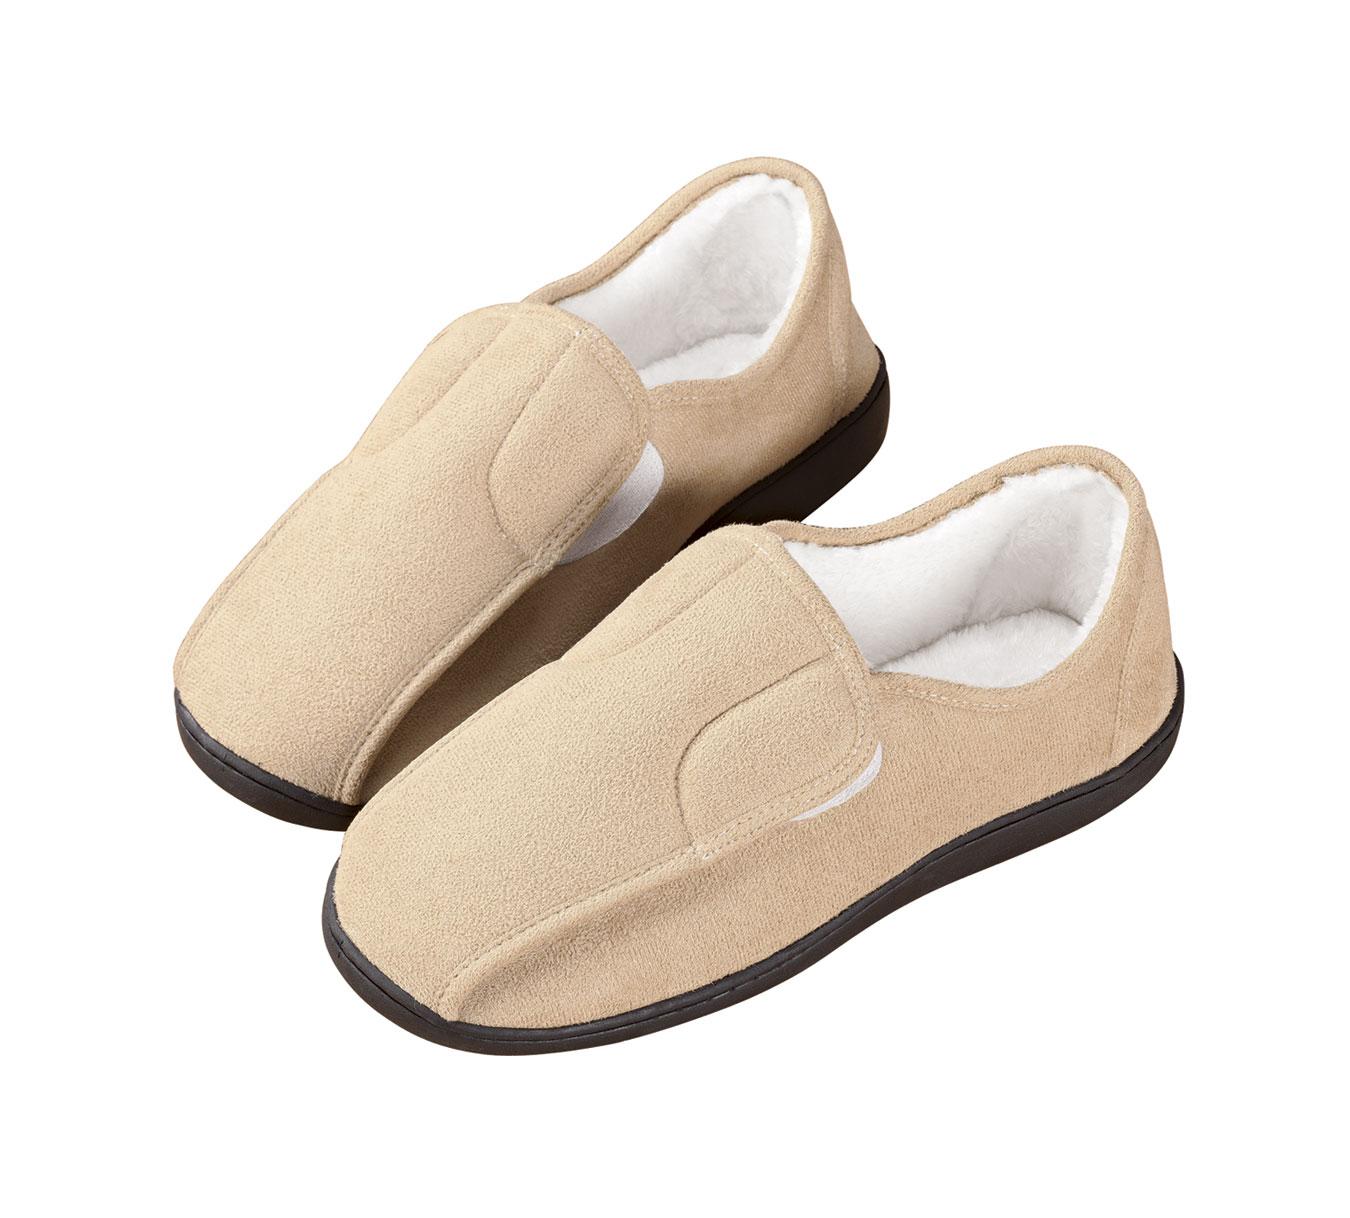 EasyComforts Easy-On Soft Memory Foam Slippers